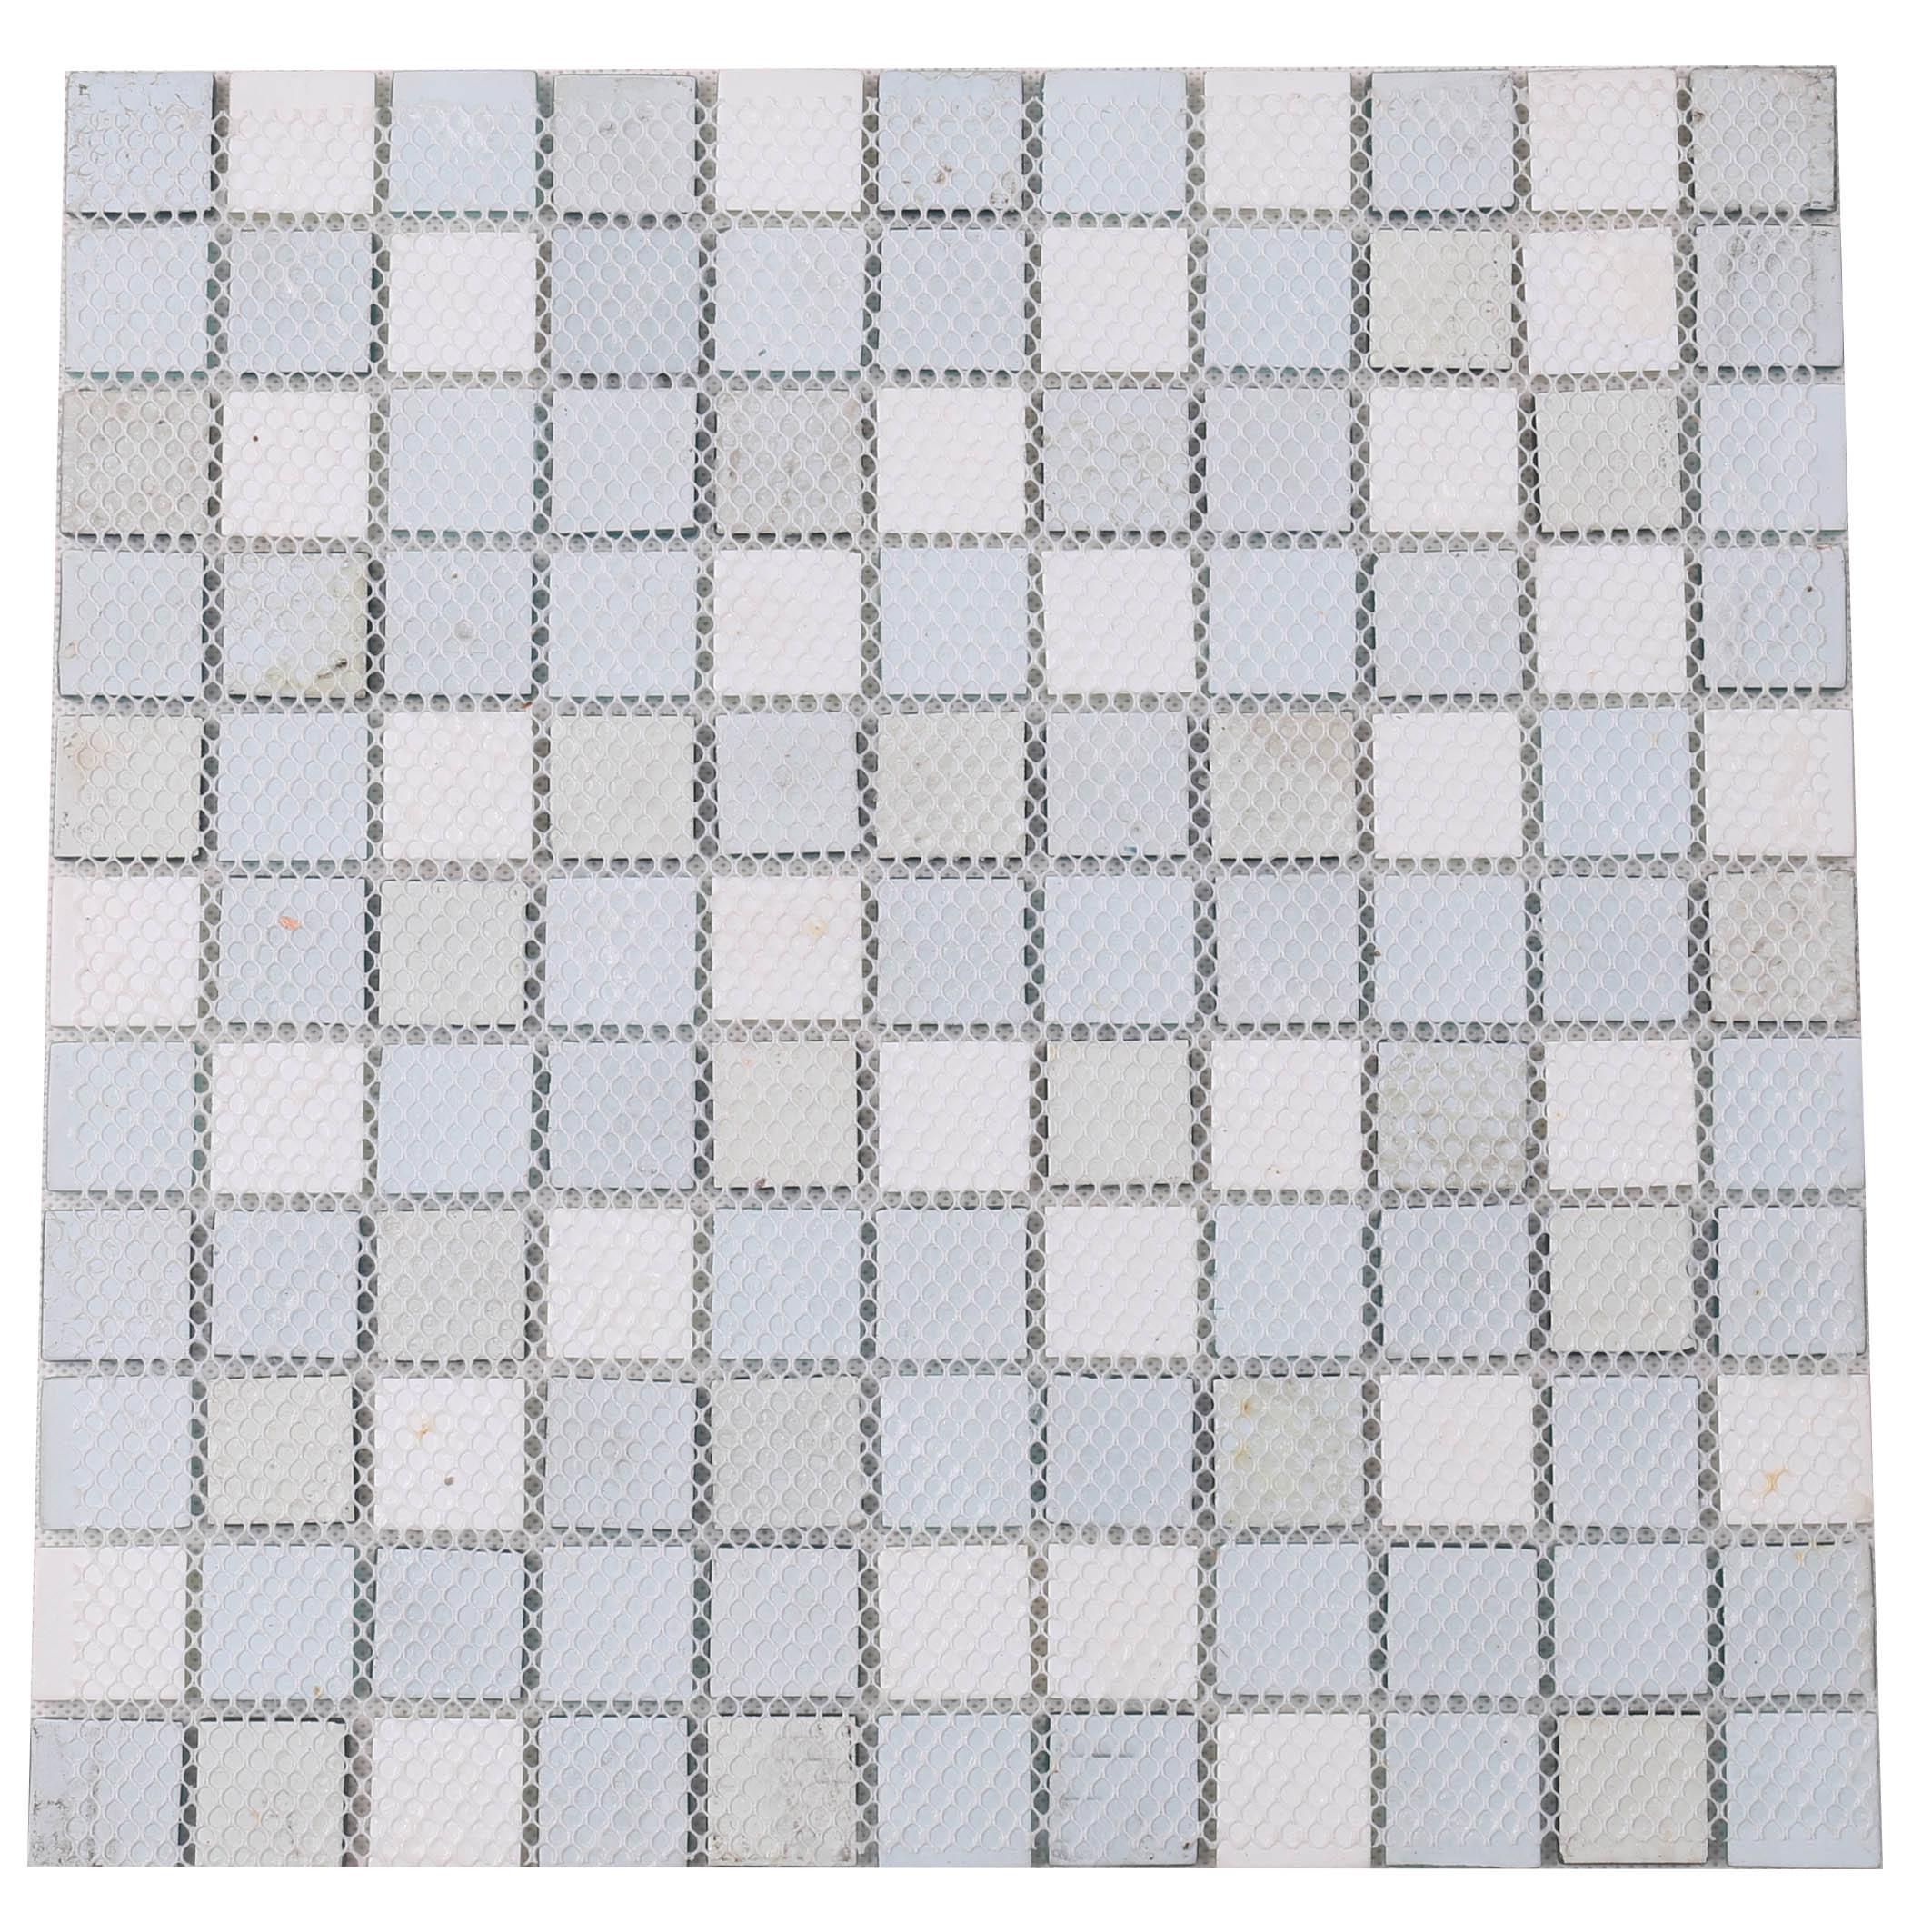 news-Heng Xing-Heng Xing luxury pool glass tile wholesale for fountain-img